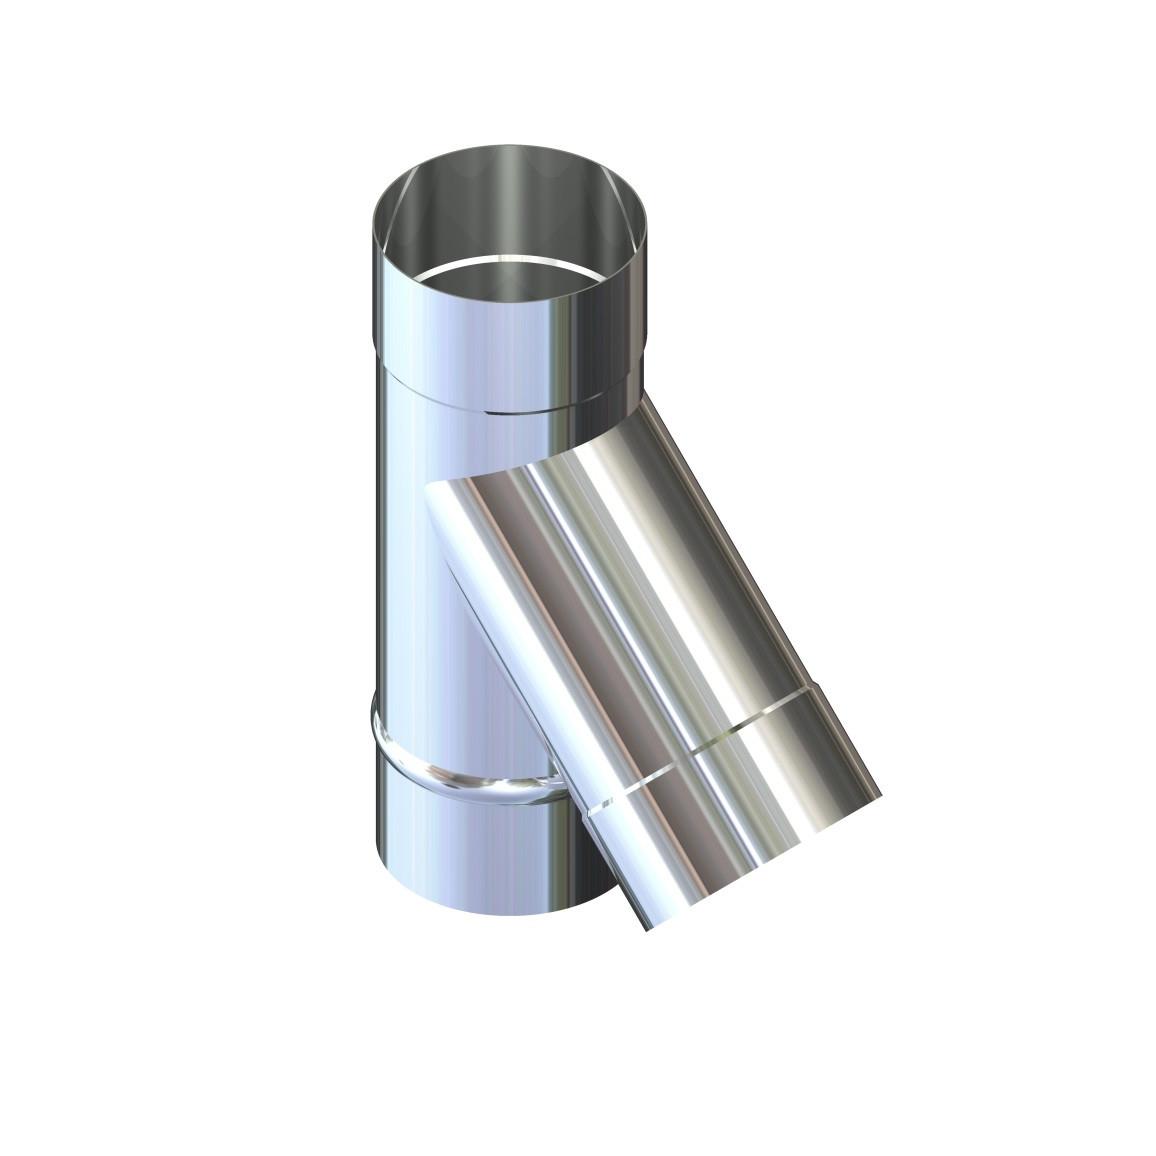 Тройник 45° для дымохода D-140 мм толщина 0,6 мм